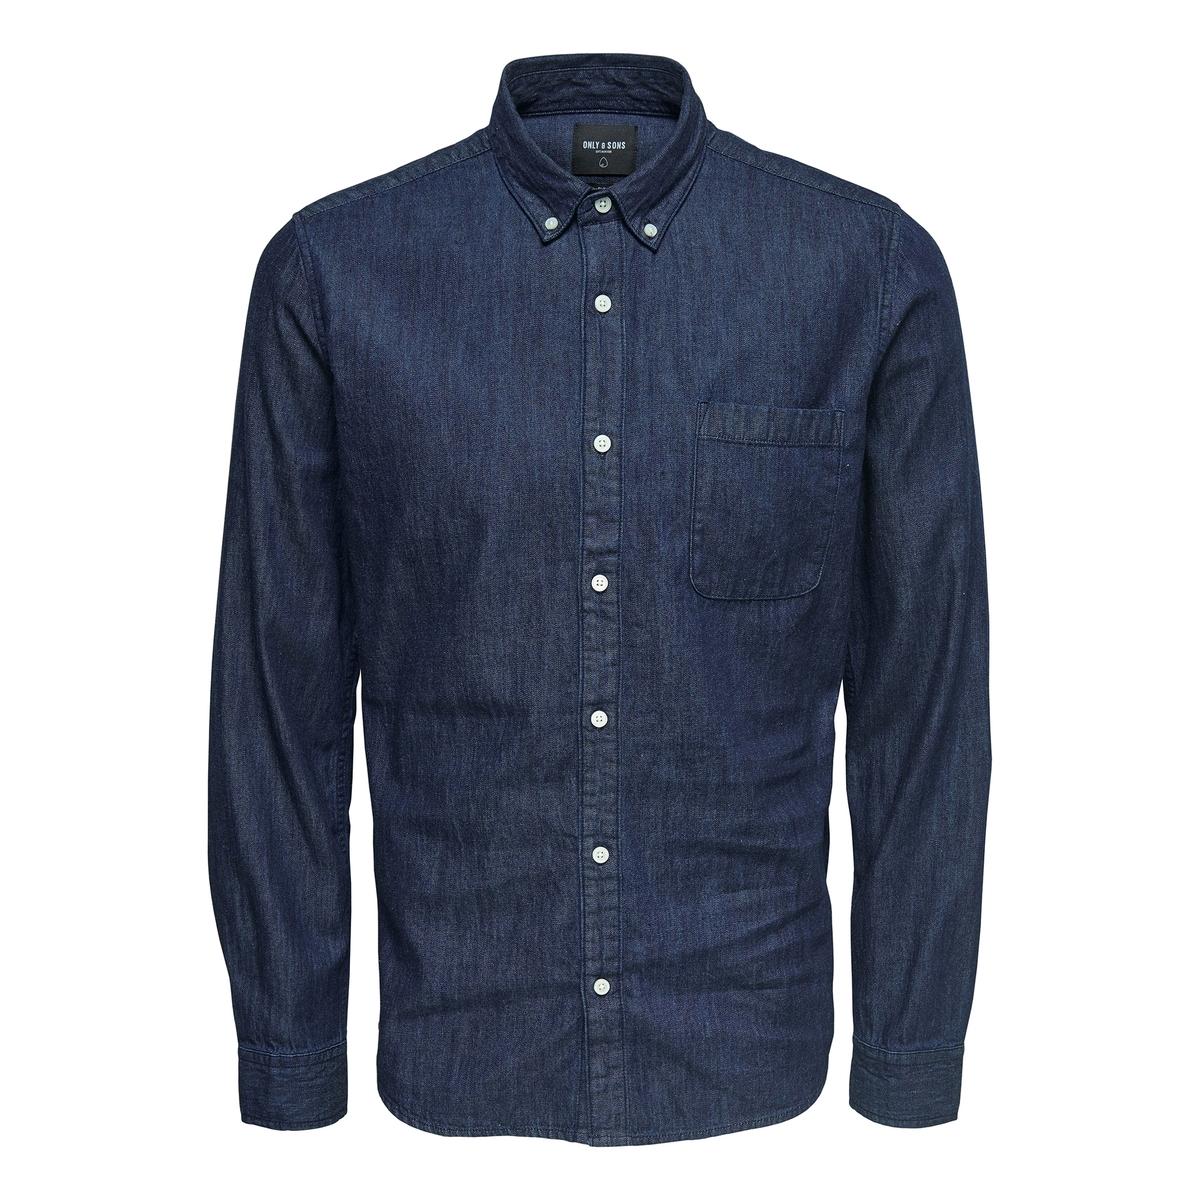 Рубашка прямая с длинными рукавами рубашка armani exchange 8nzc61 z8apz 0501